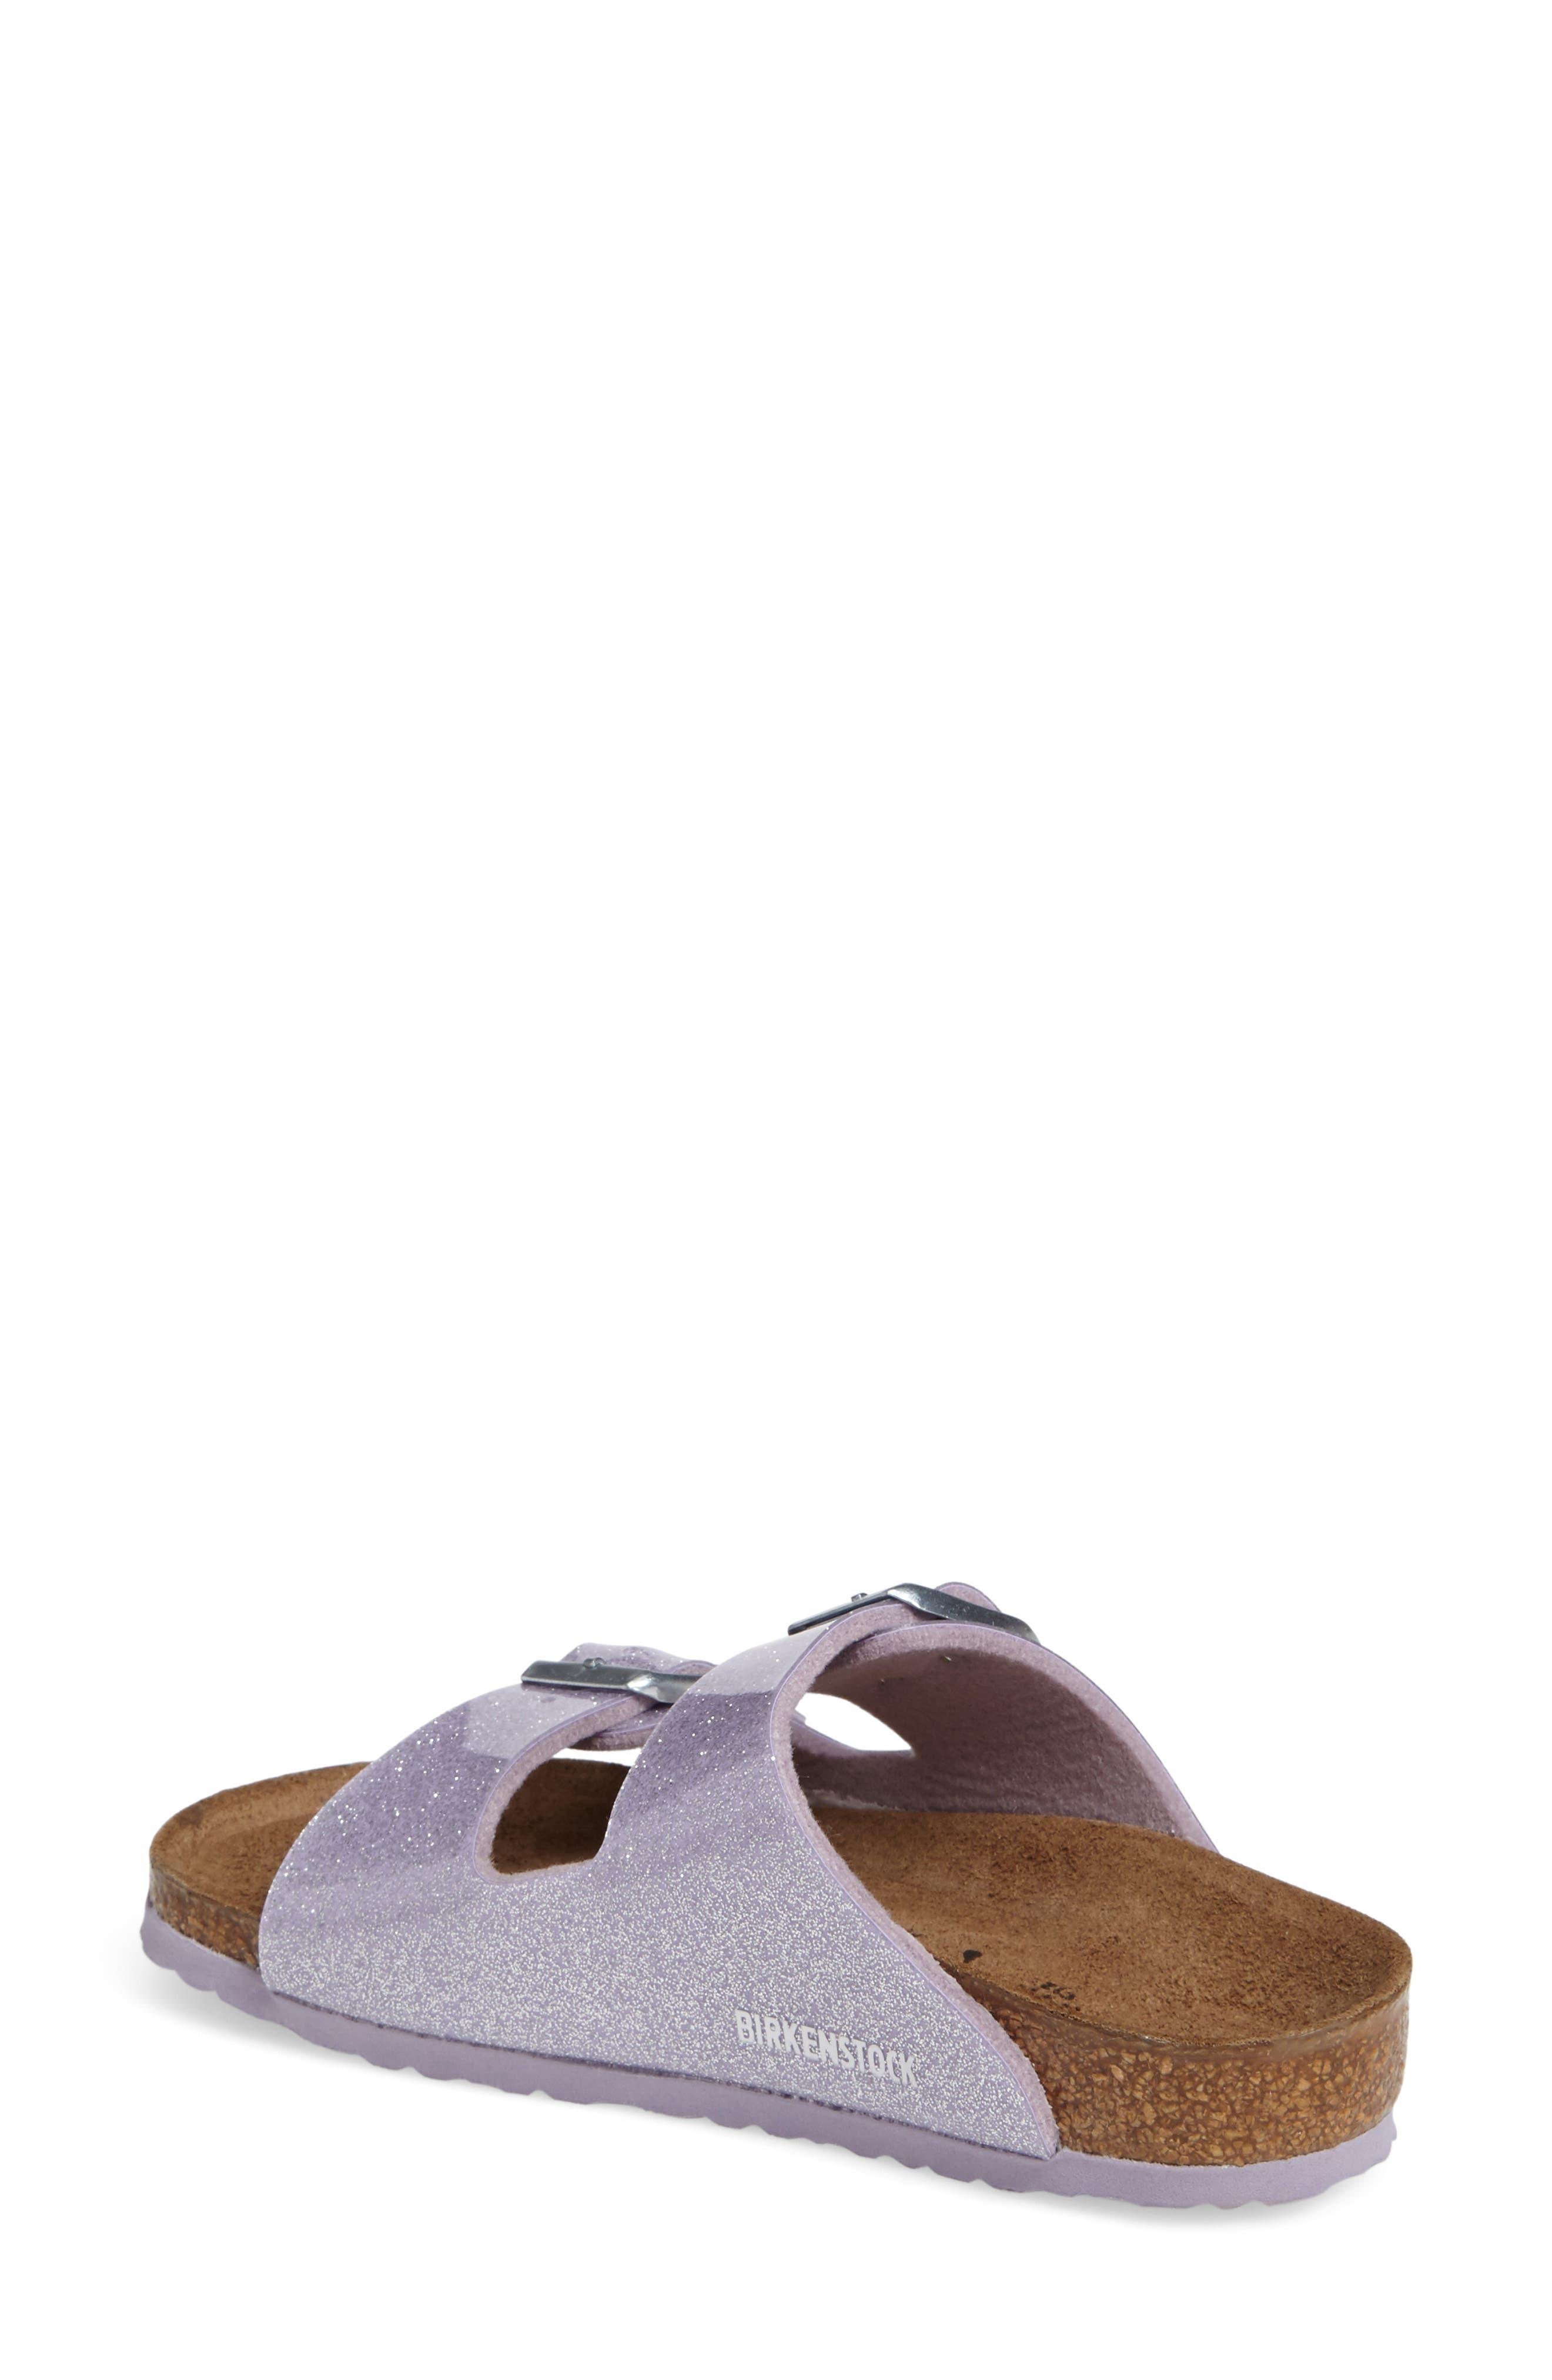 'Arizona Galaxy Birko-Flor' Slide Sandal,                             Alternate thumbnail 7, color,